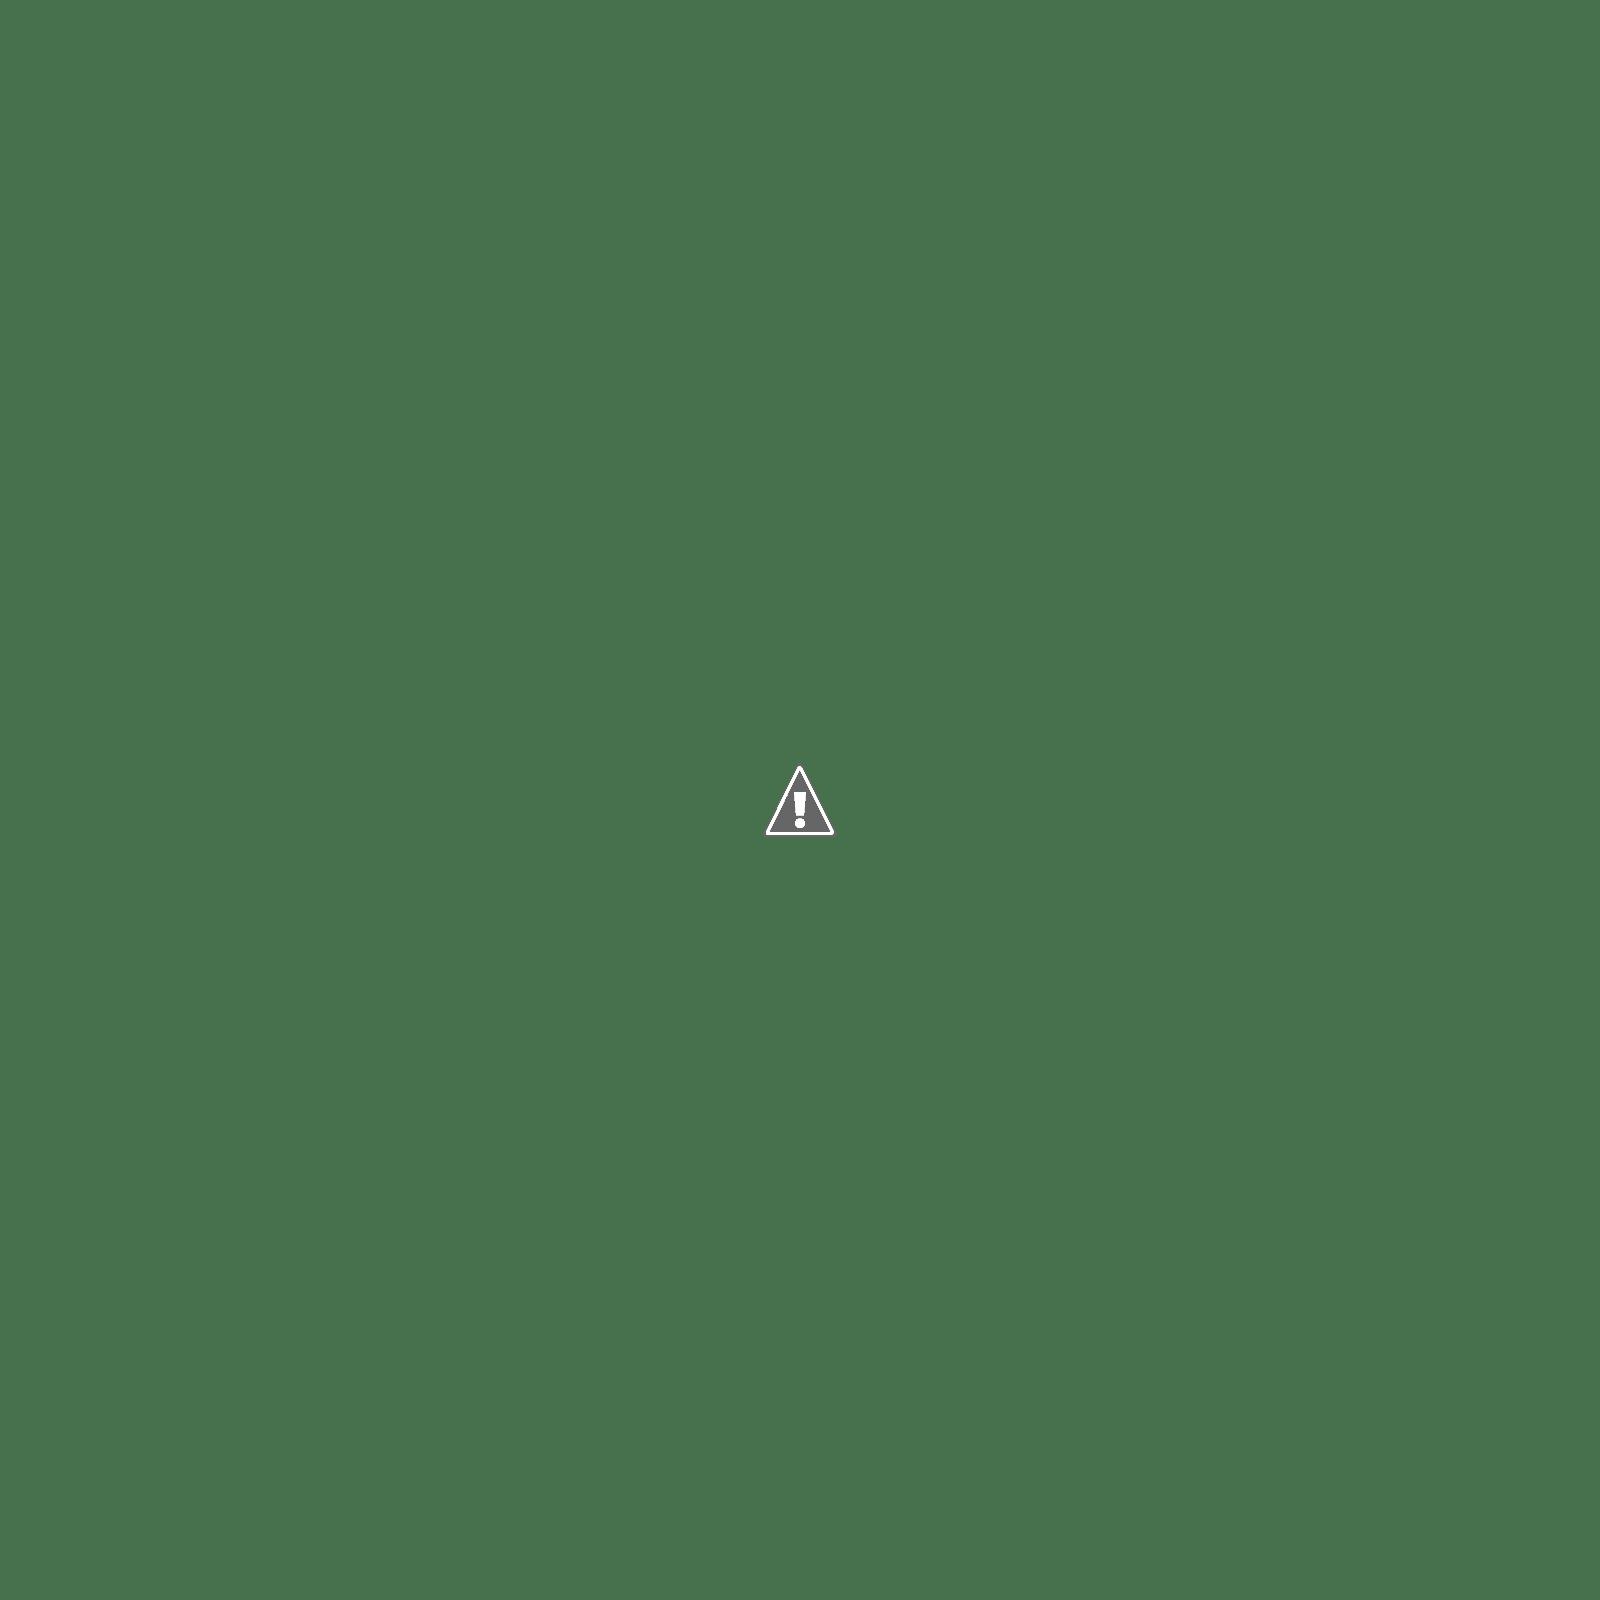 Boruto: Naruto Next Generations - Chapter 9